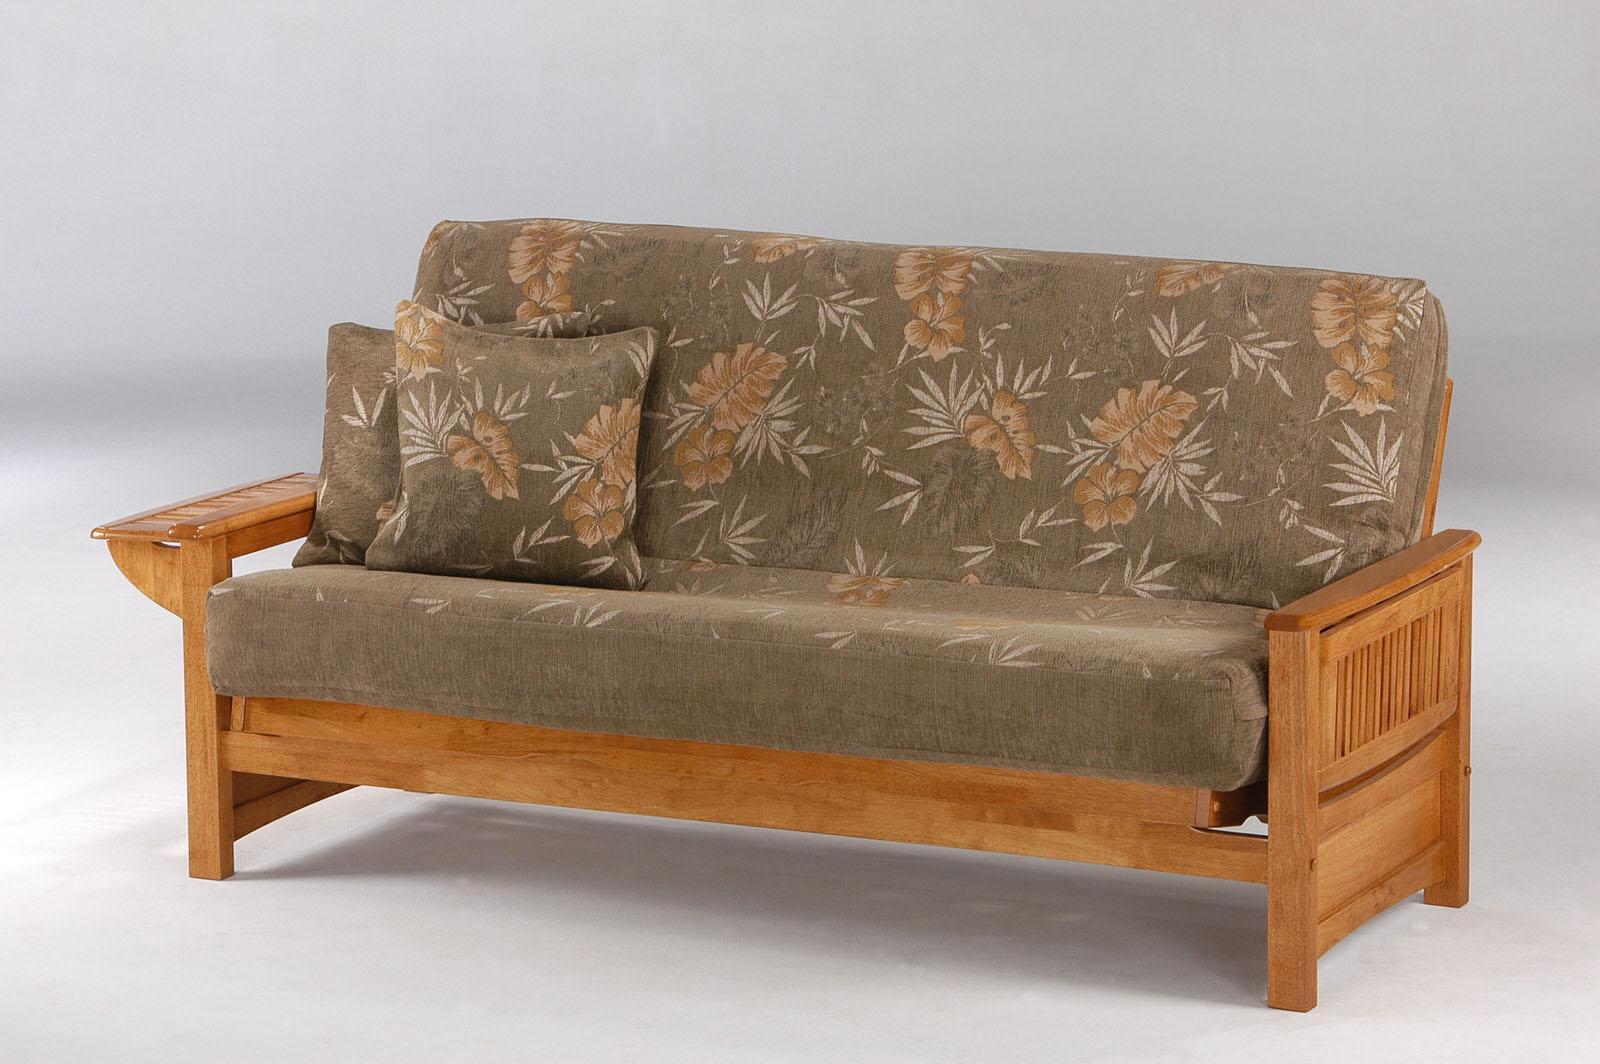 sunrise premium futon frame by night u0026day furniture  night  u0026 day furniture  sunrise premium futon frame by night u0026day furniture  rh   functionalfurniturenyc